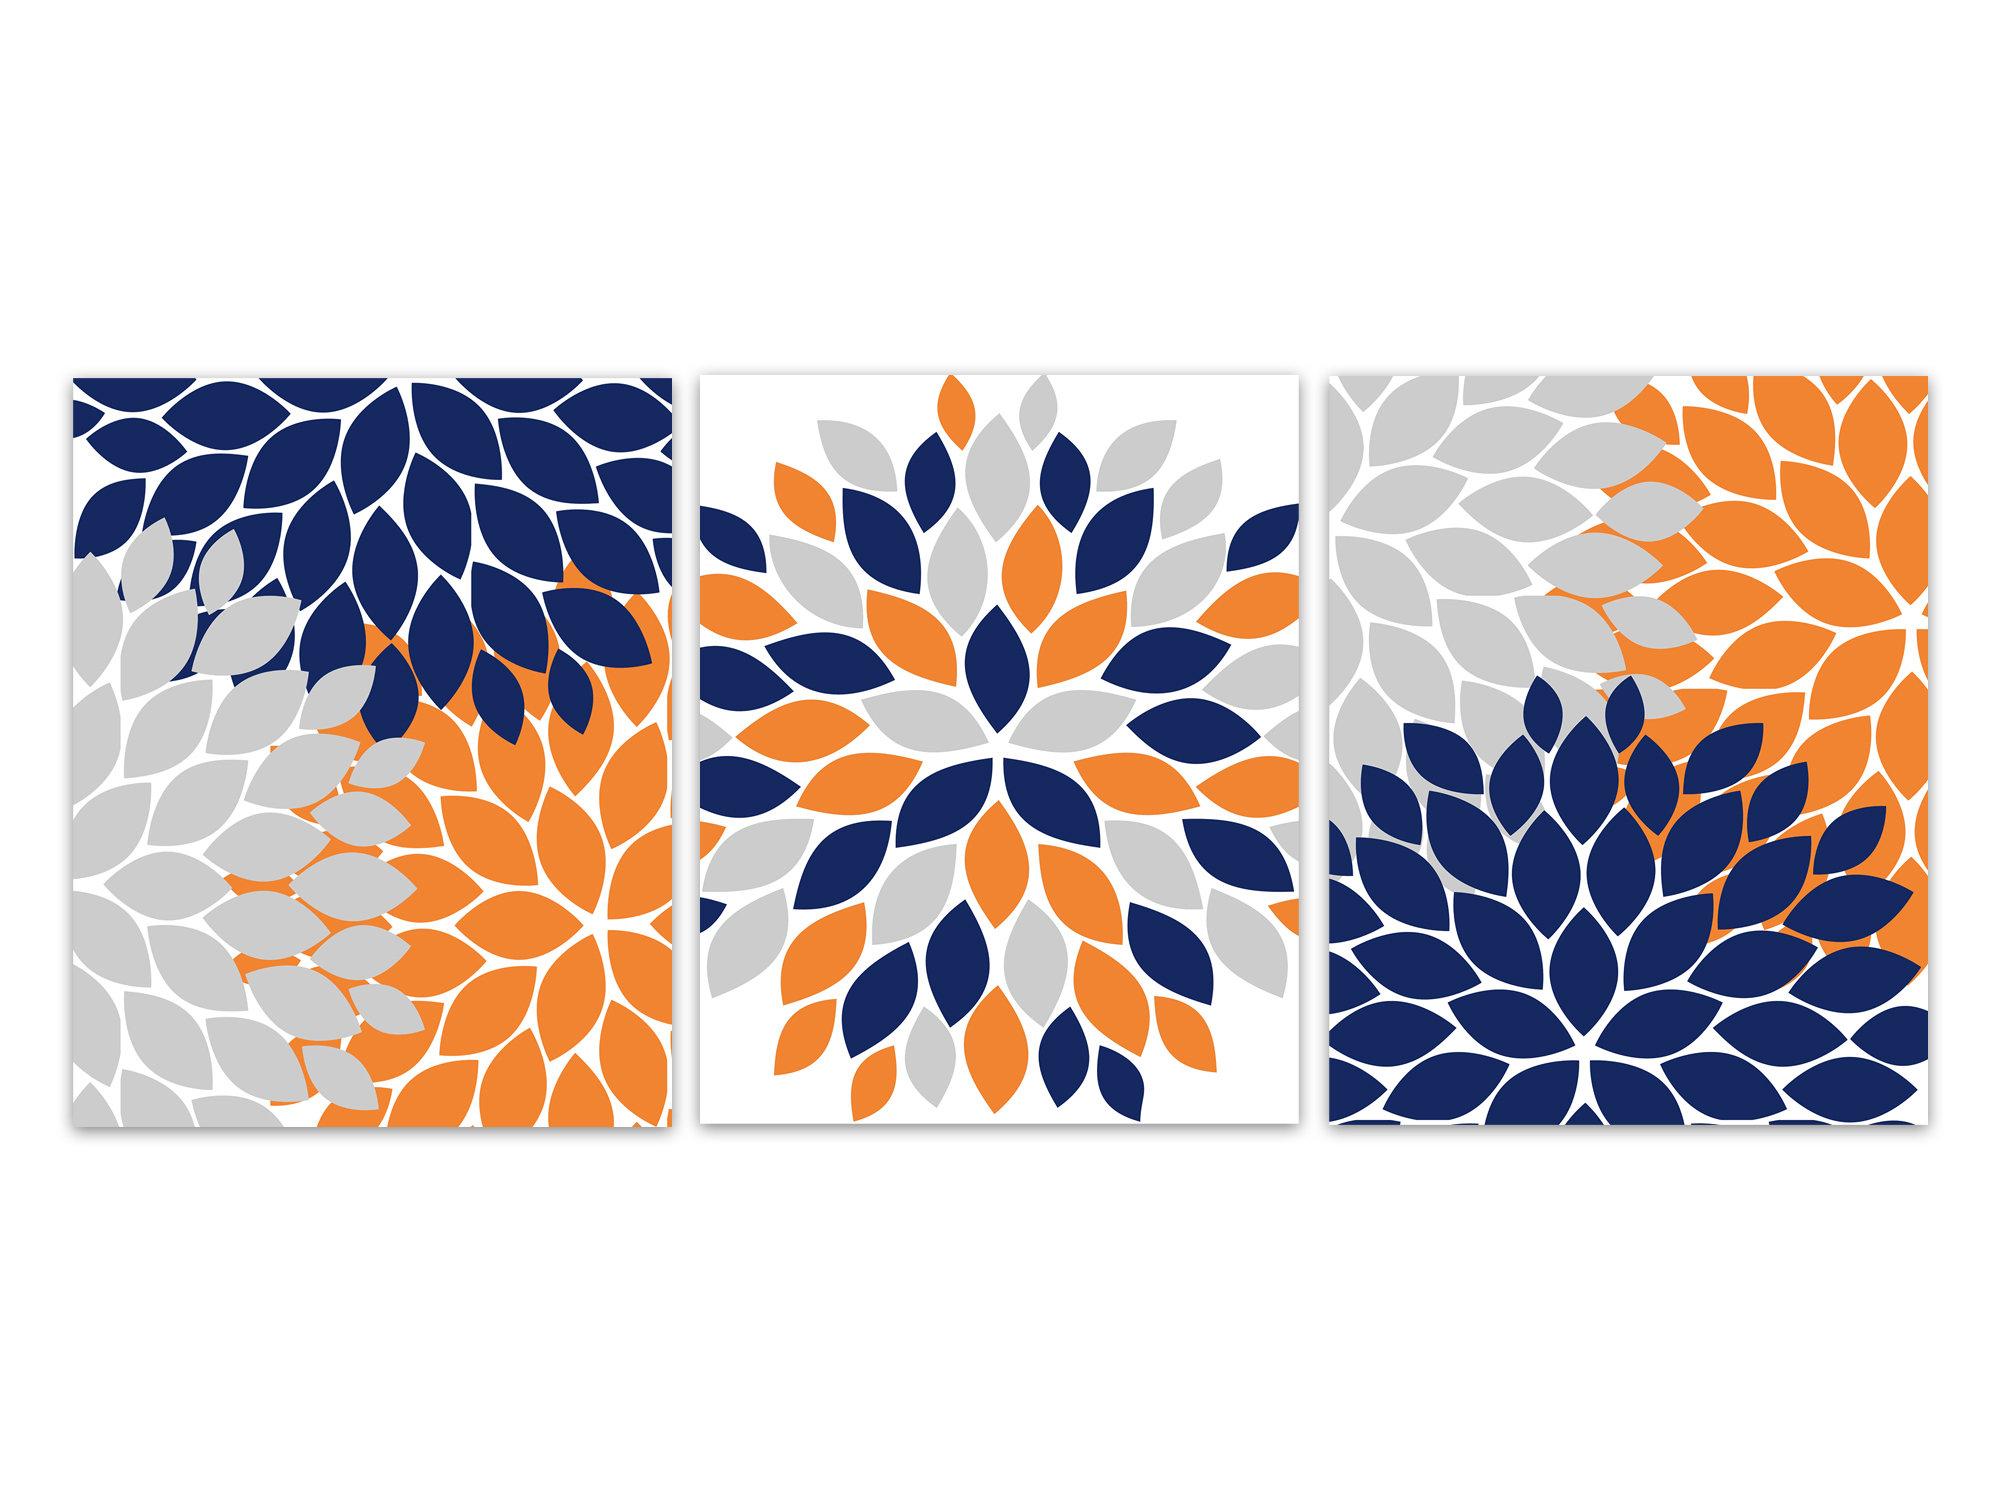 Home Decor Canvas Or Prints Home Decor Wall Art Orange And